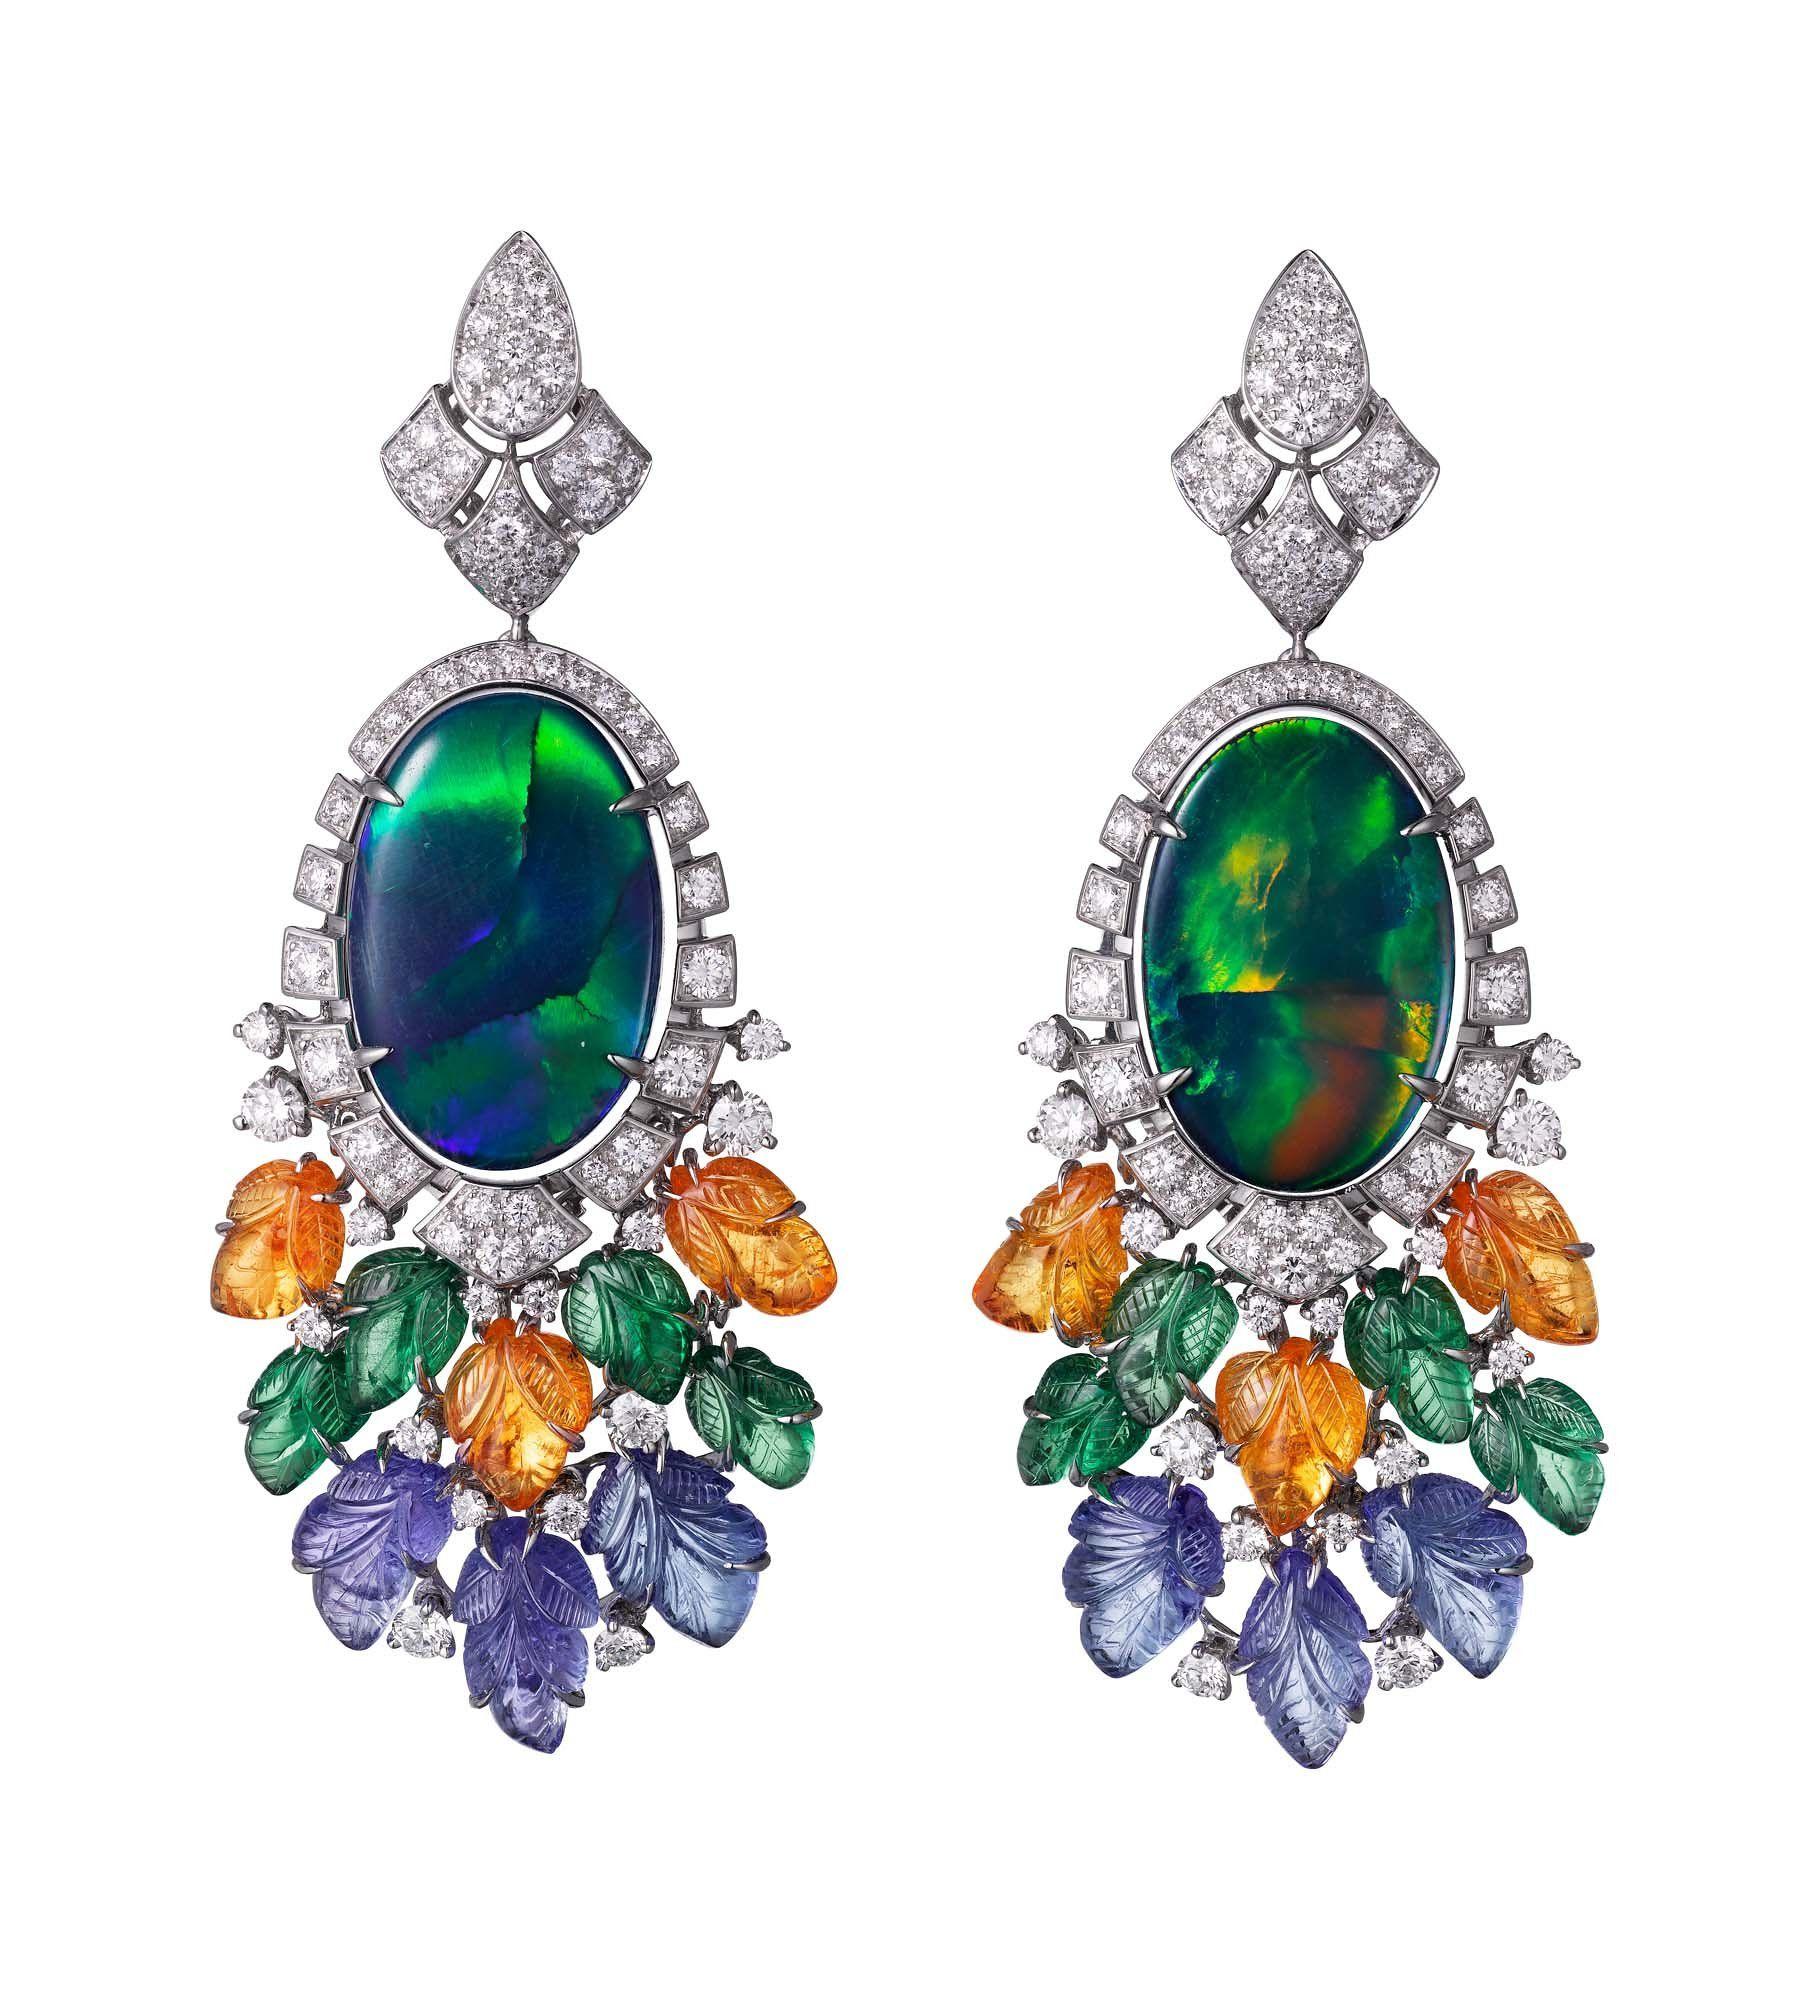 Étourdissant Cartier earrings in white gold, black opals, mandarin garnets, tsavorite garnets, tanzanites, and diamonds.